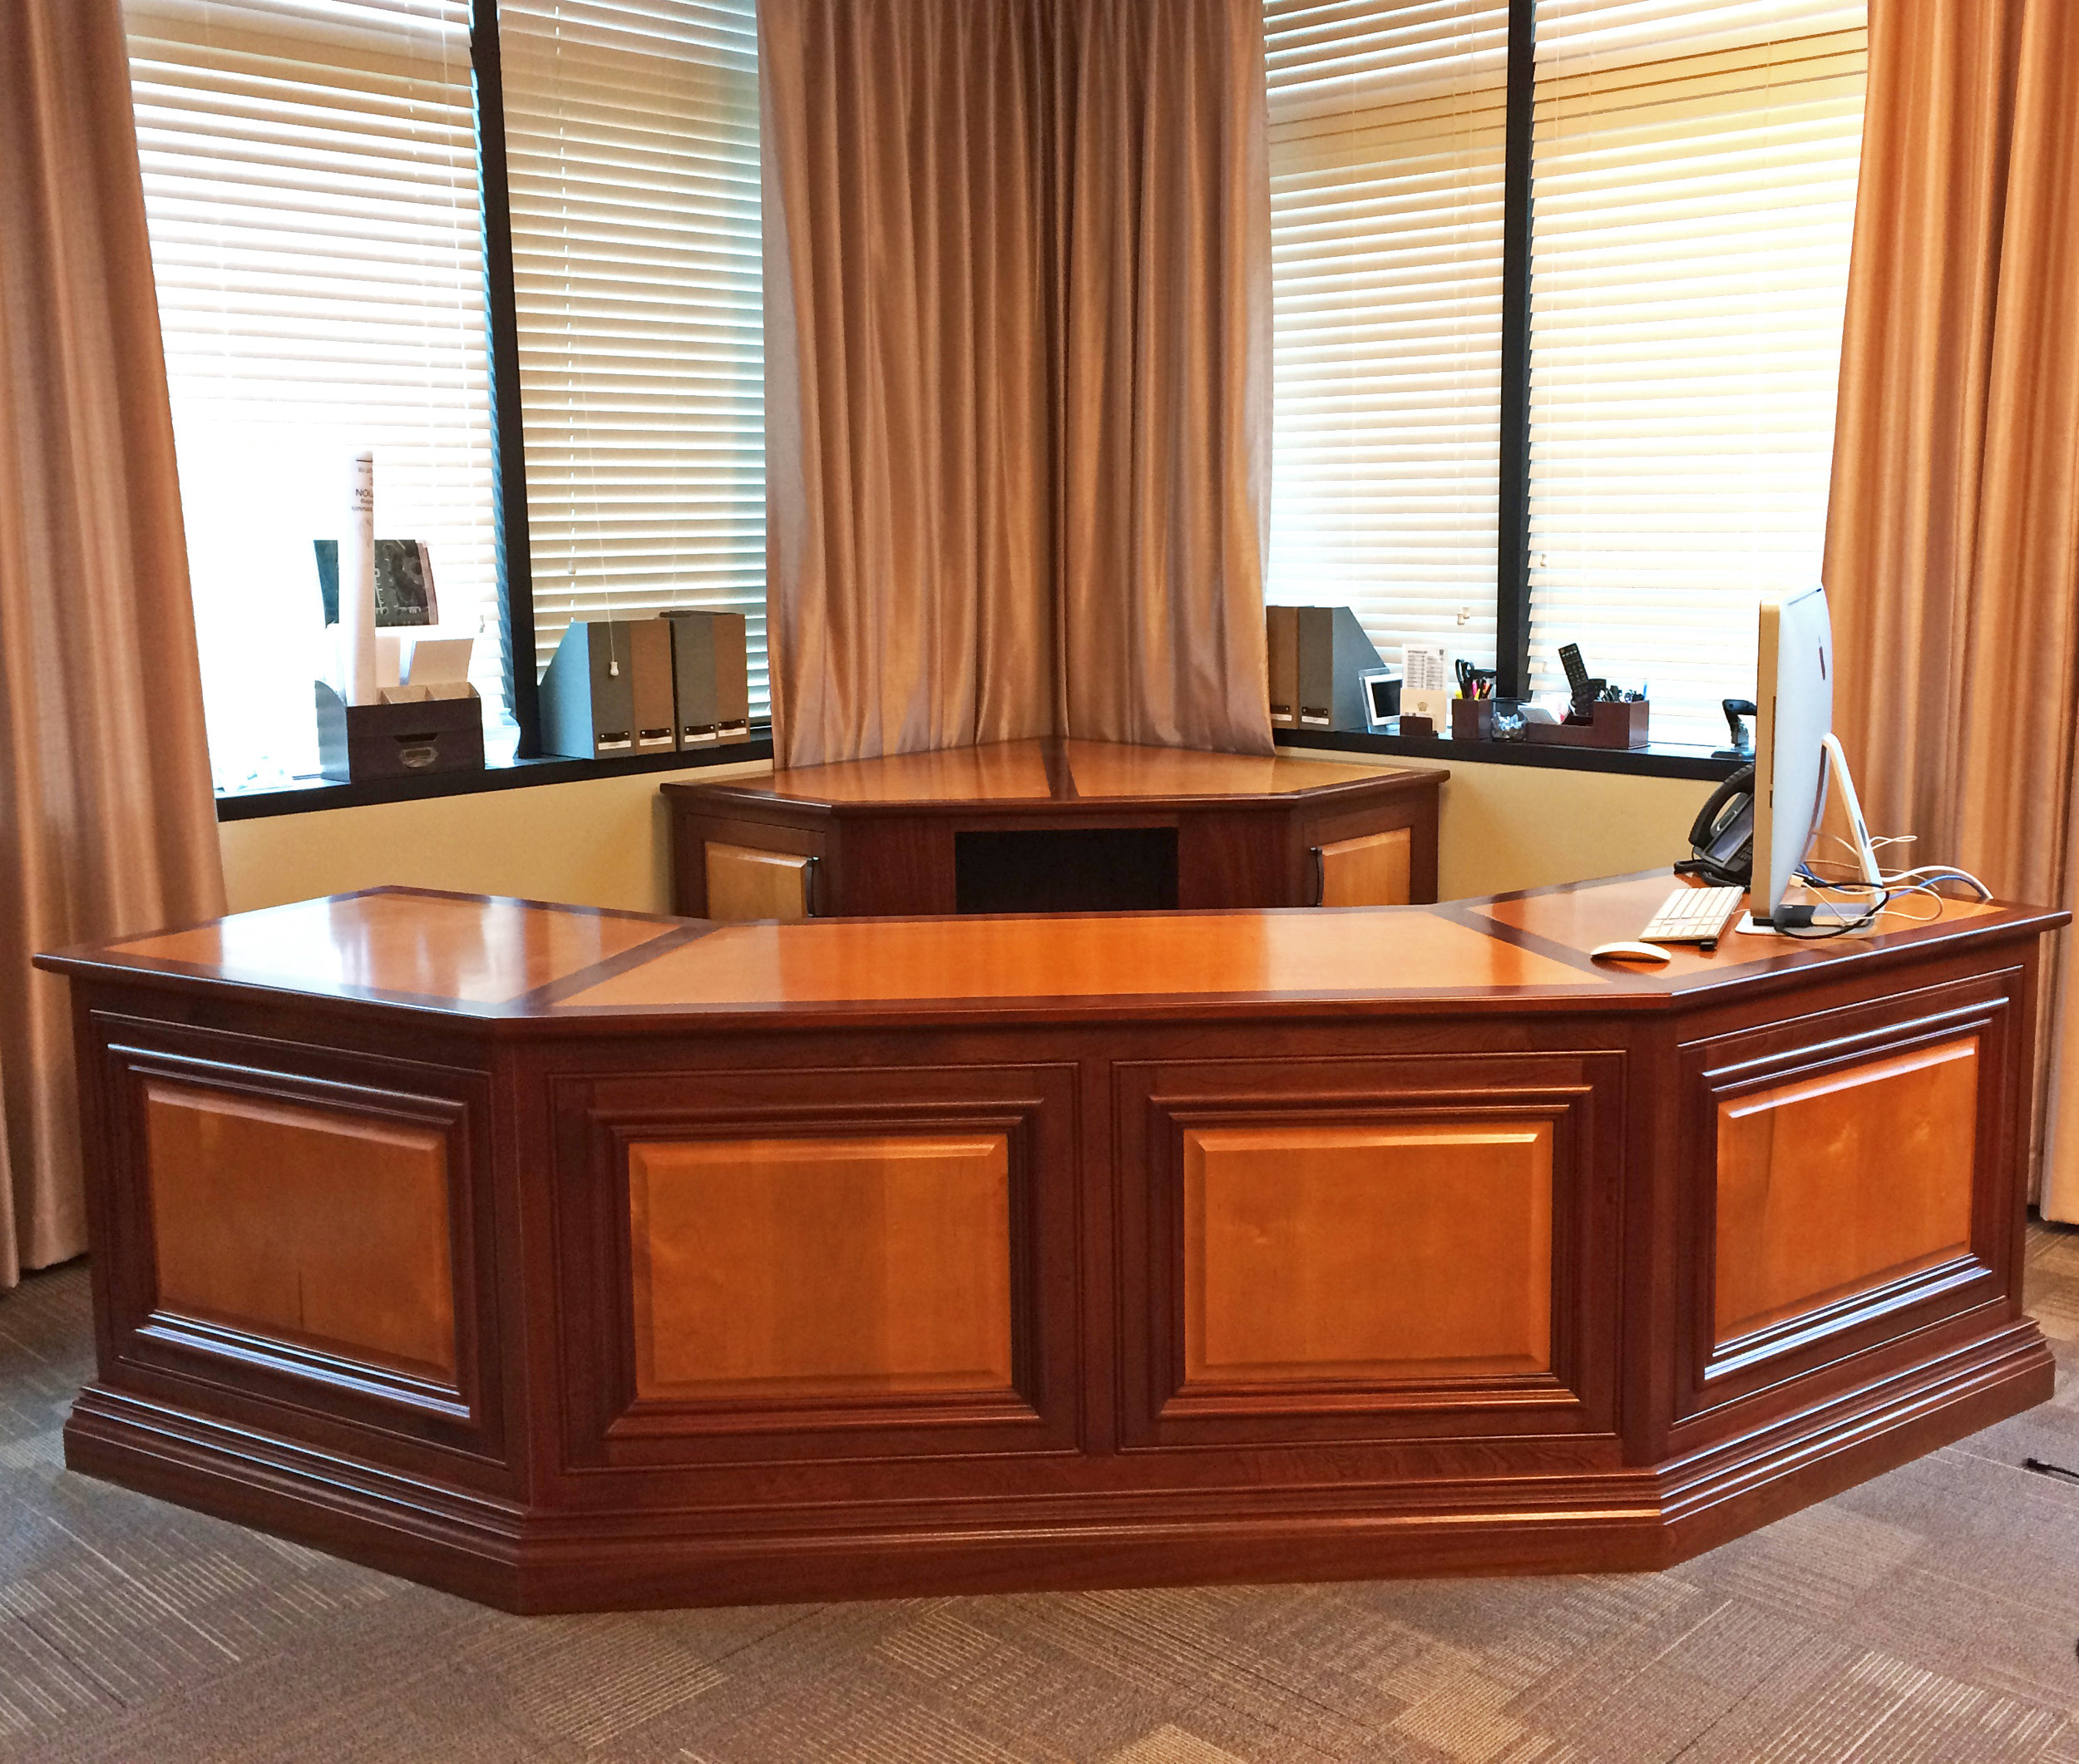 Executive Desk Mahogany & Maple Inlay Countertop & Raised Panel Front Detail